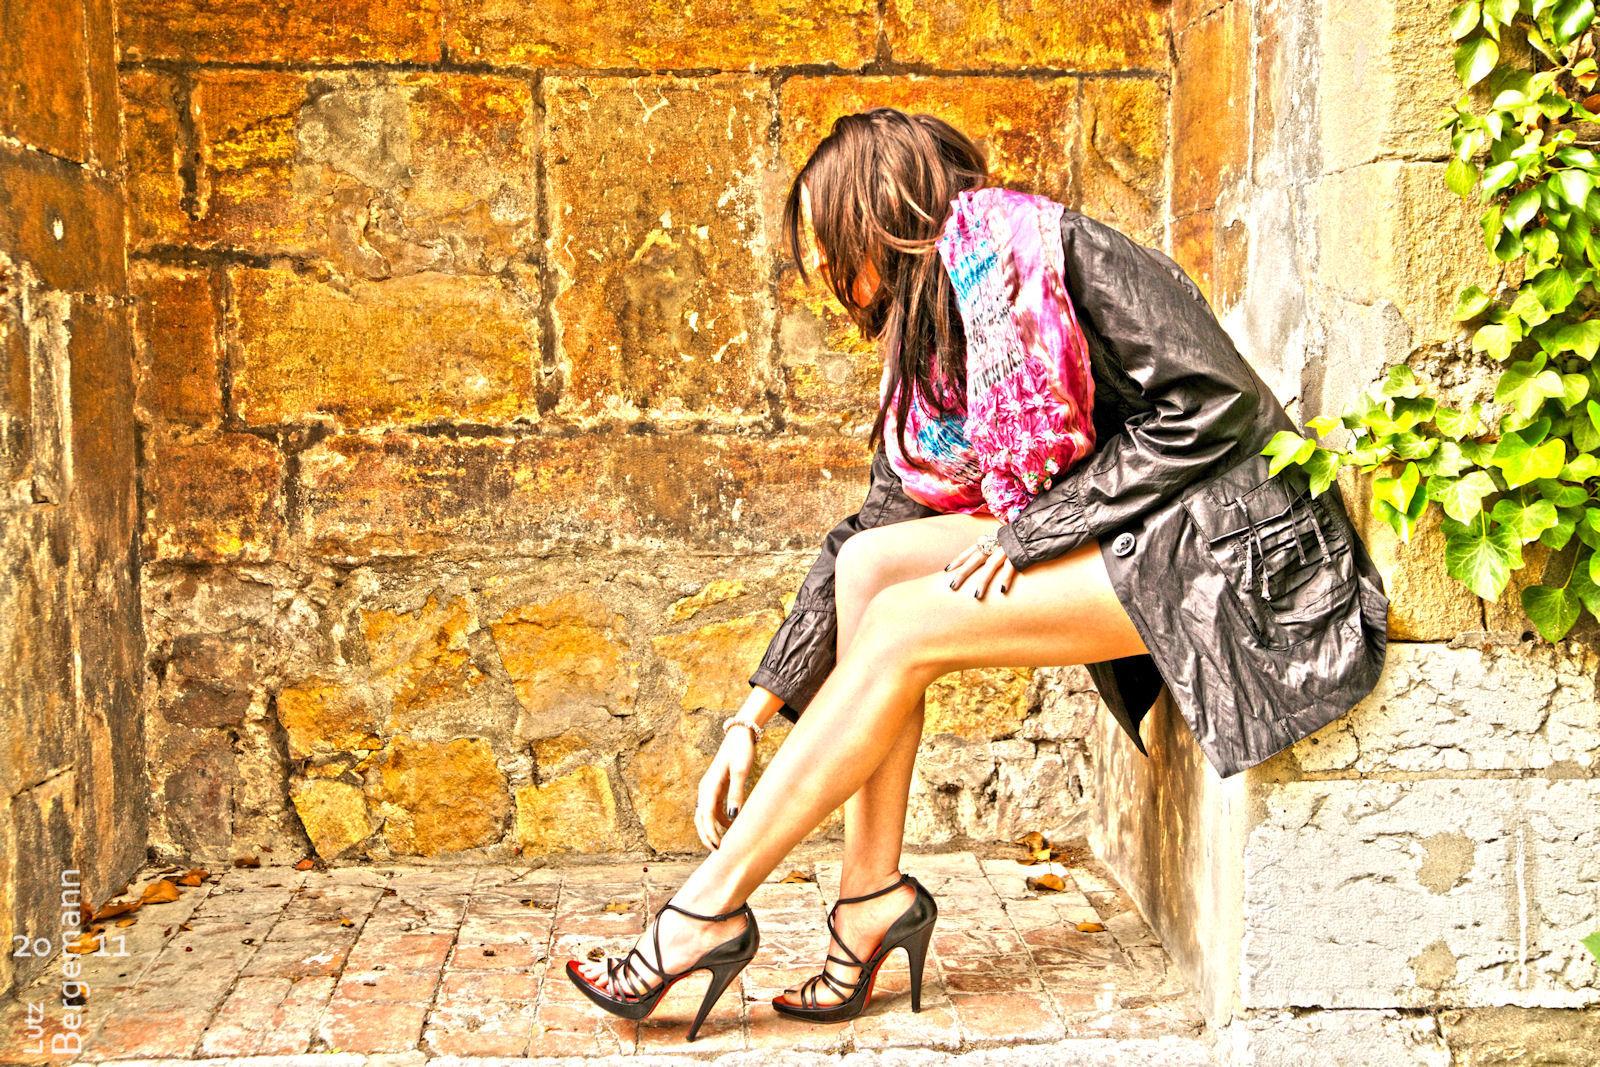 Sephora showing her legs and Heels